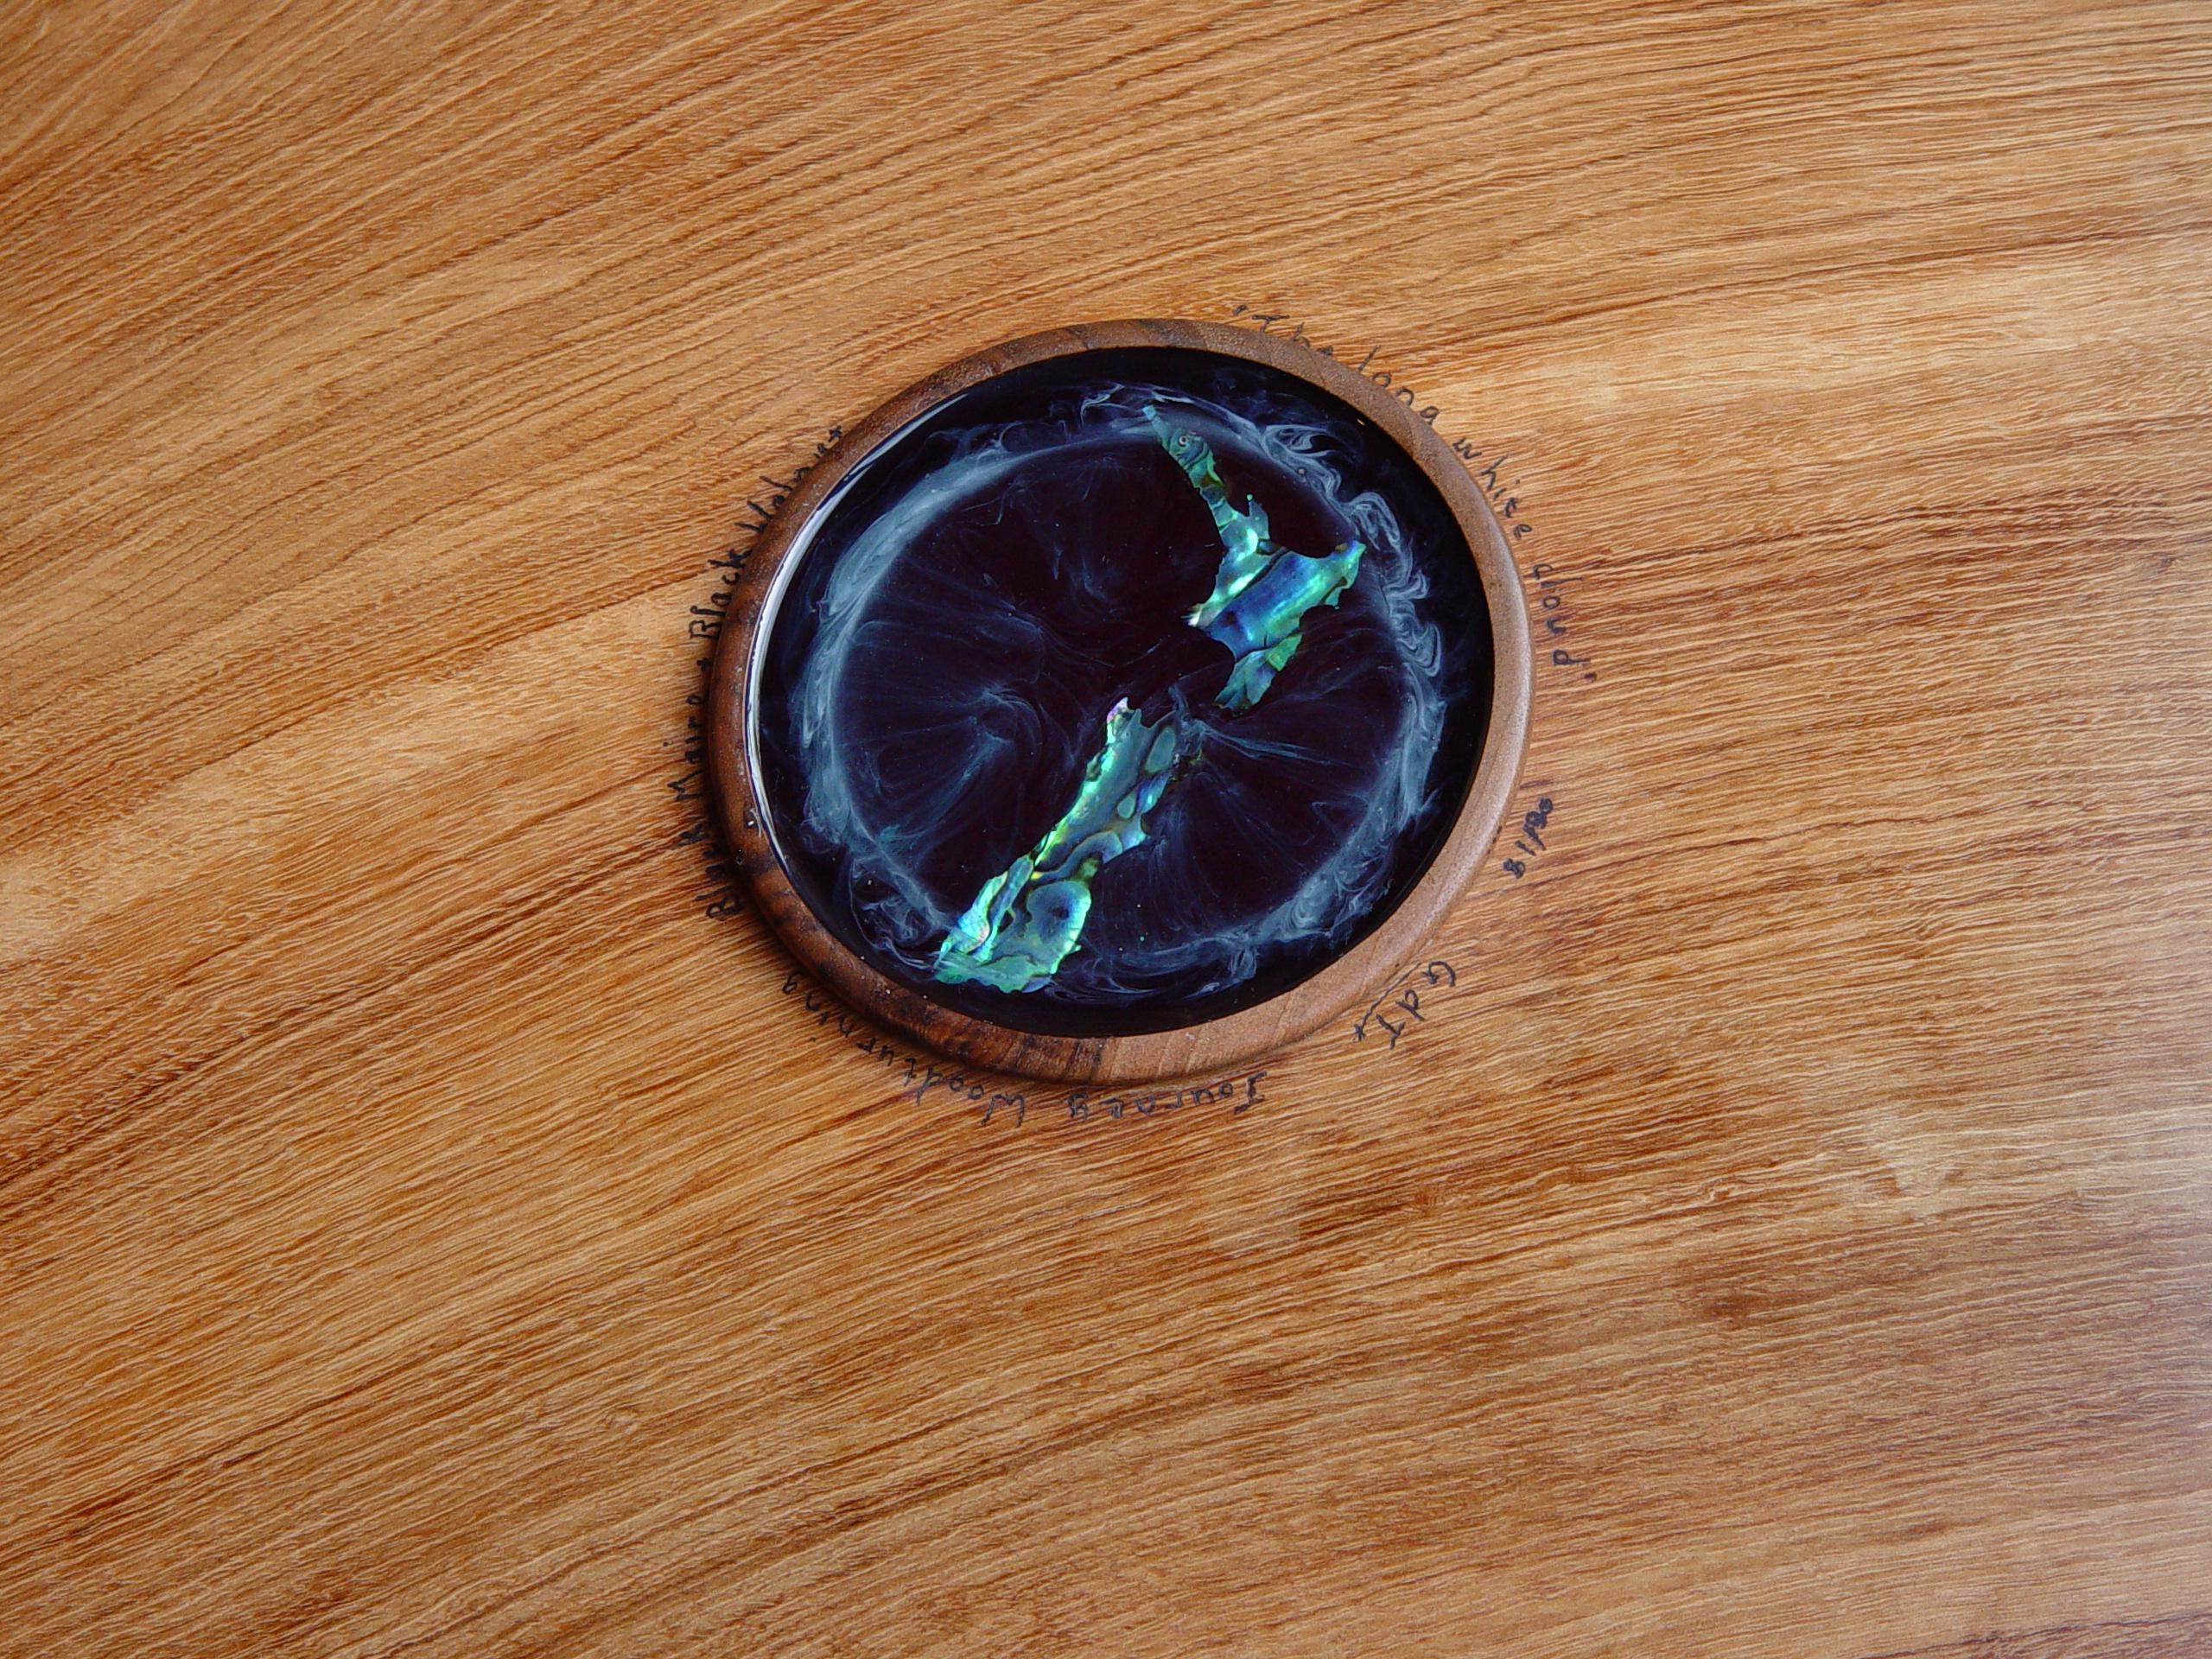 Acrylic Resin and Paua inlay